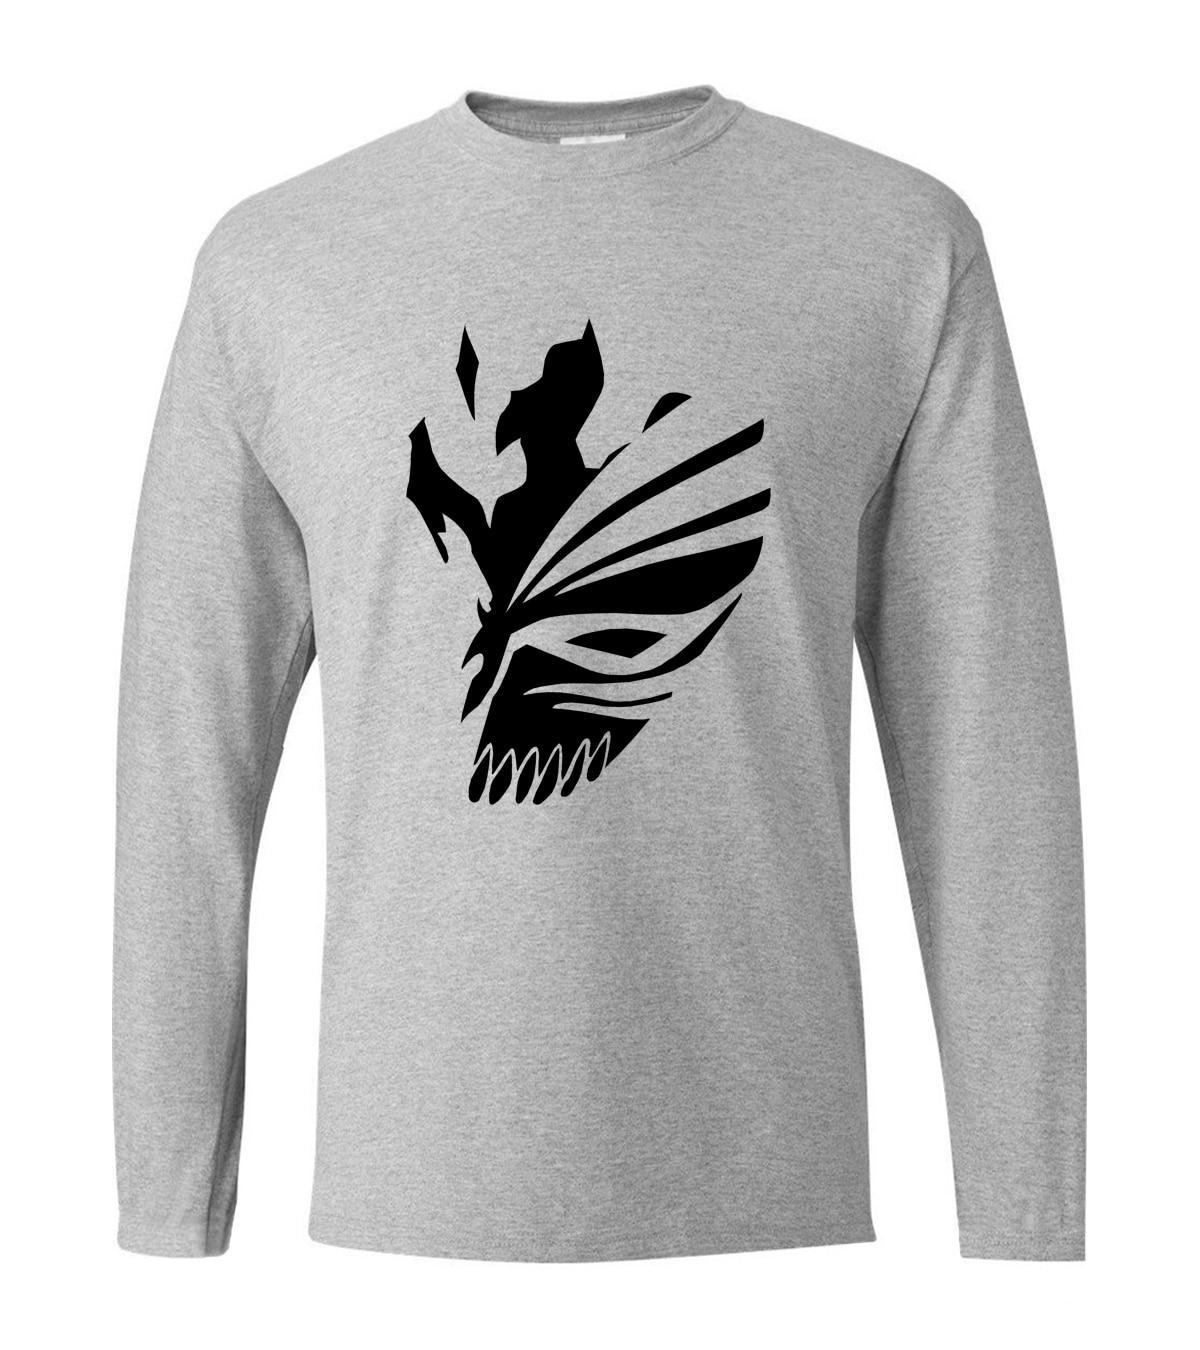 Anime BLEACH Kurosaki Ichigo hip hop men's long sleeve T-shirts 2019 new spring 100% cotton fitness hipster men's sportswear